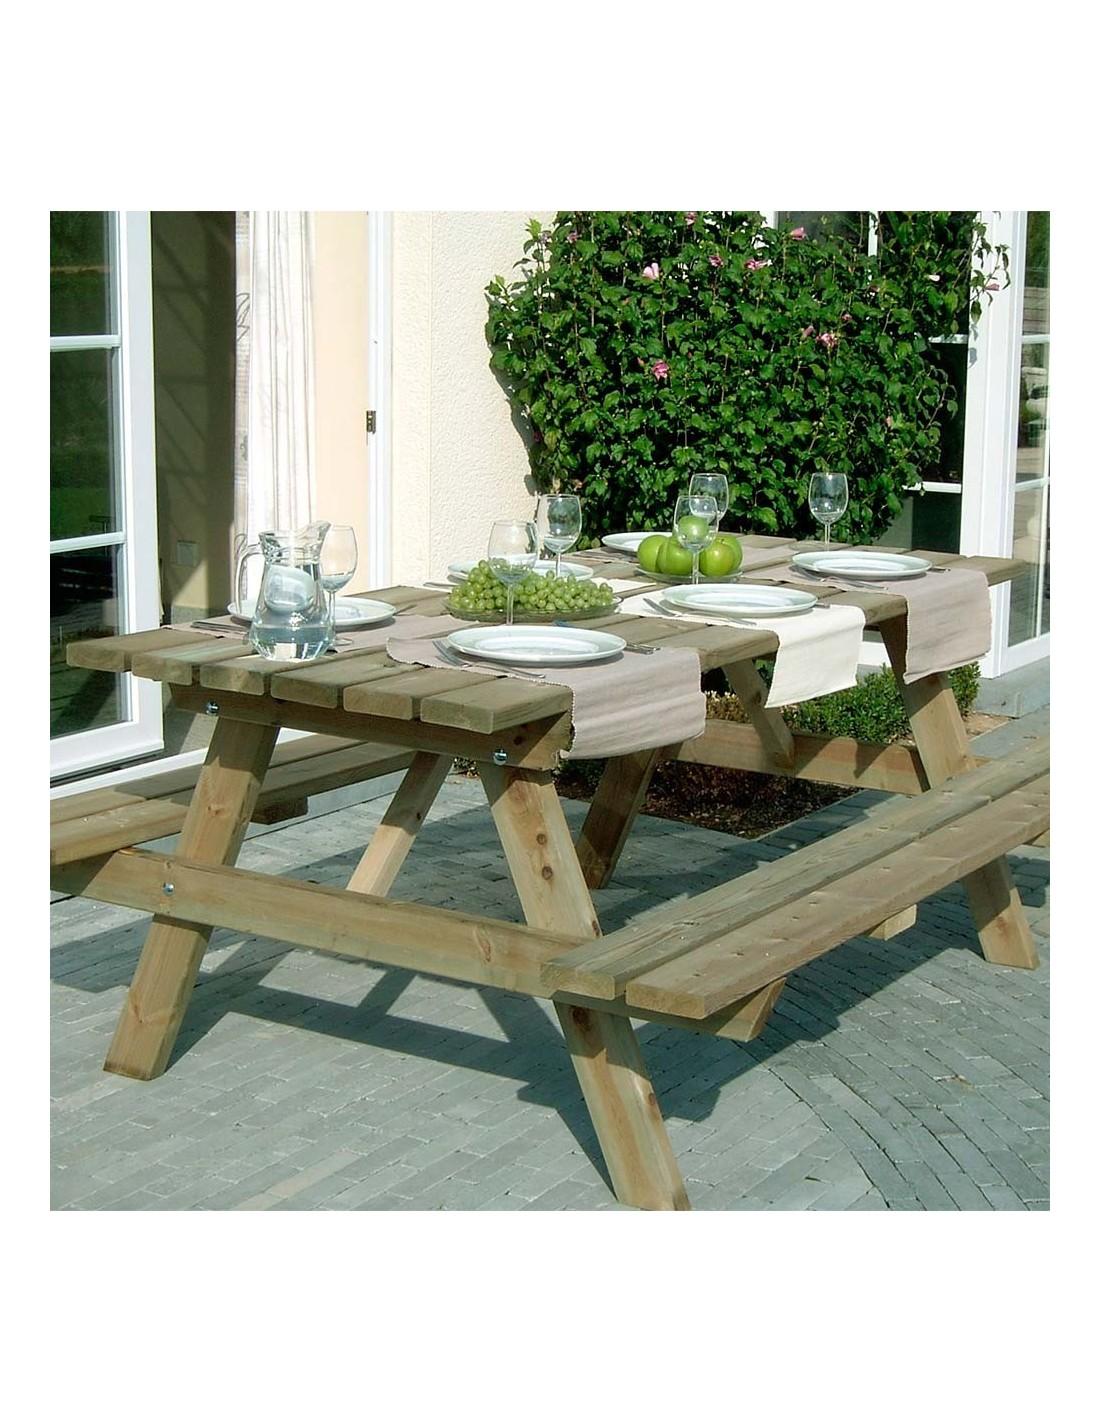 Verrassend Pic-Nic tafel - bank Afmeting 180 x 145 cm UQ-58